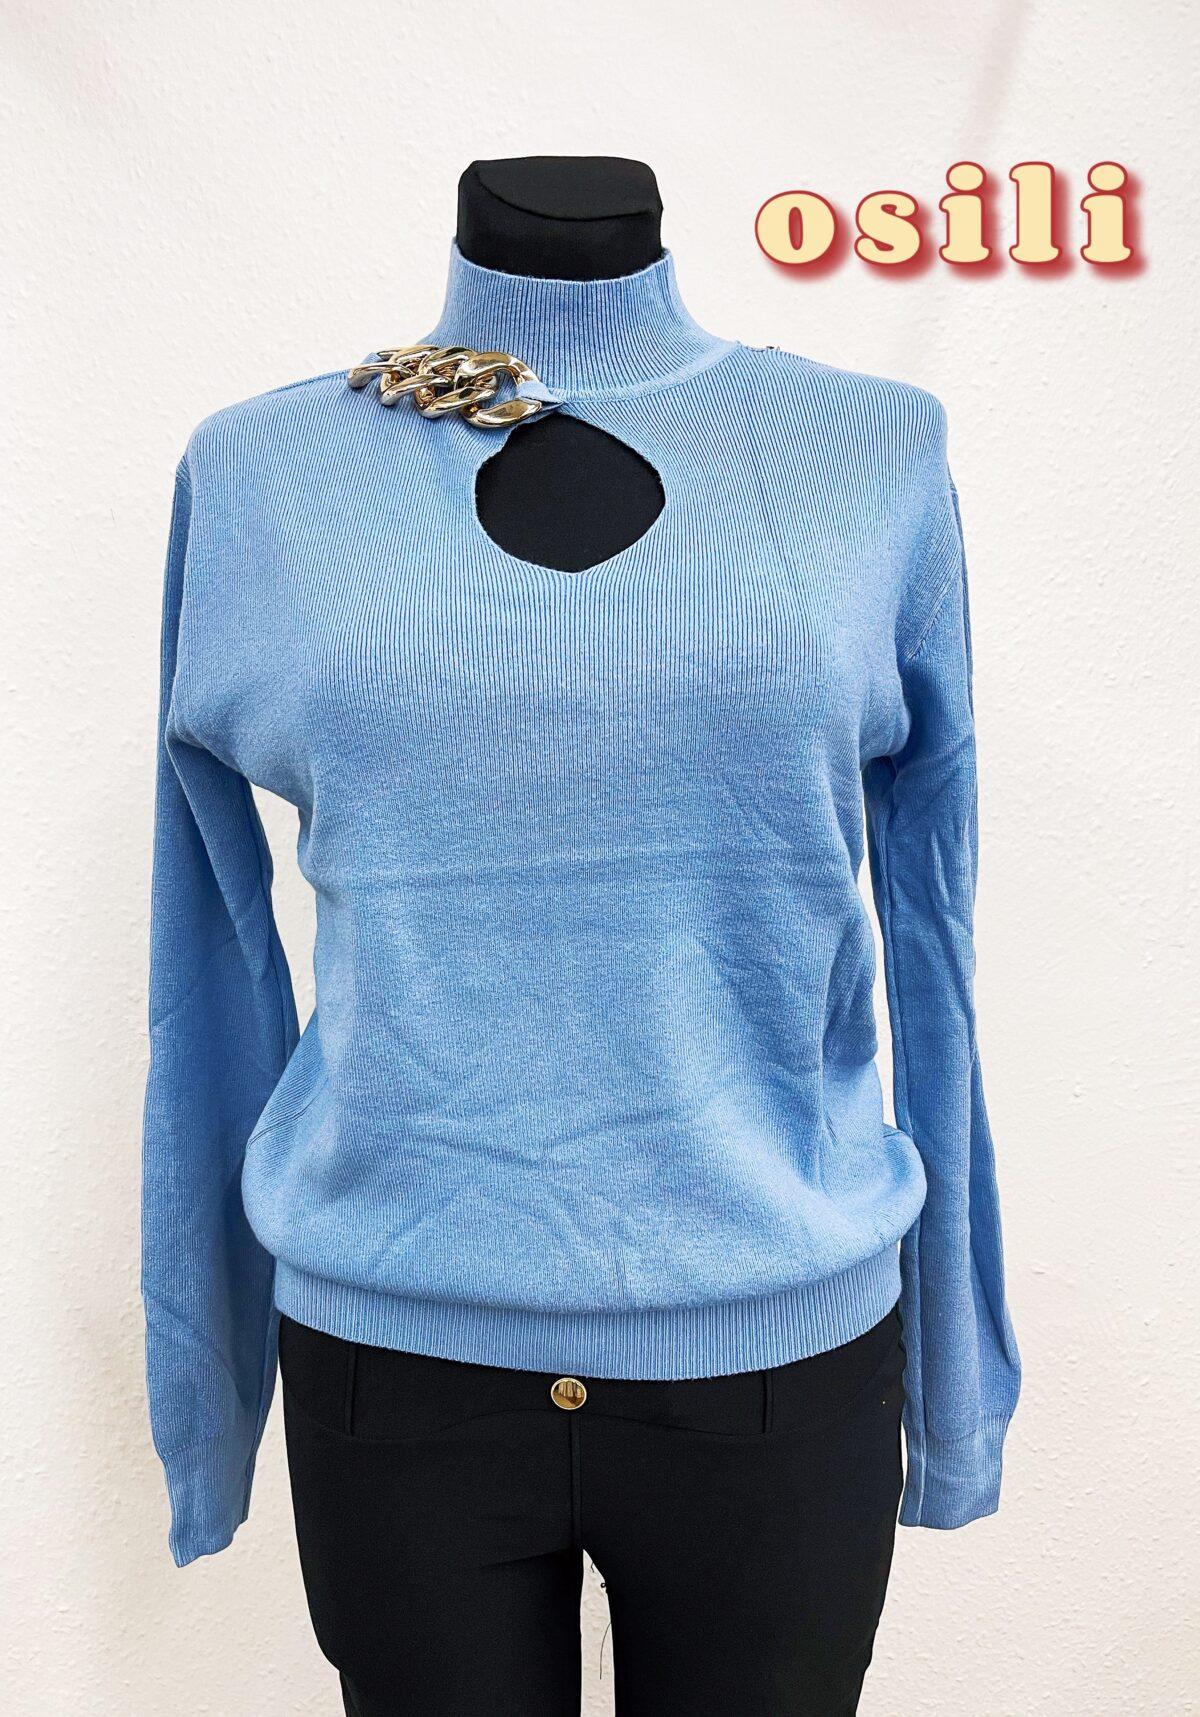 654A7A29 BCCE 47E5 818A CA936A962DBC scaled Osili - Fashion - Divat